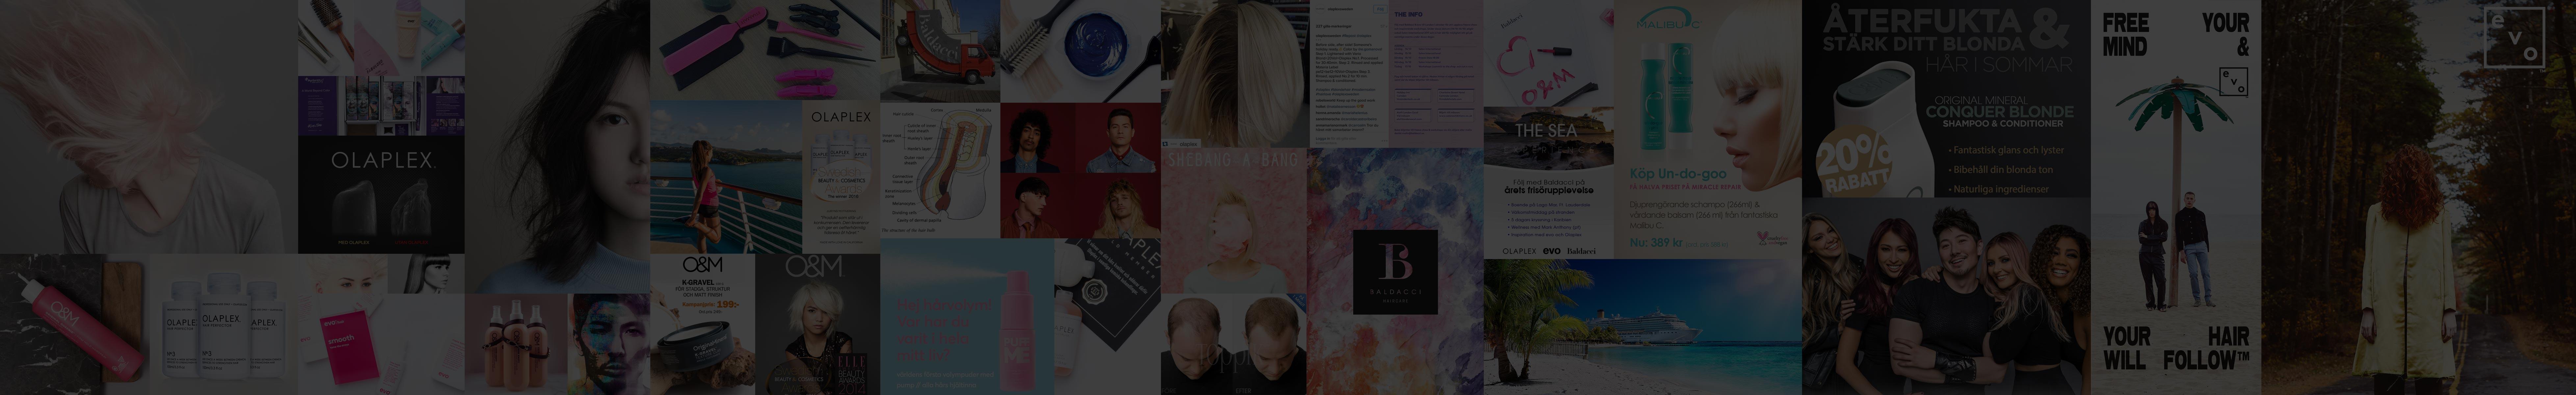 device presentation background